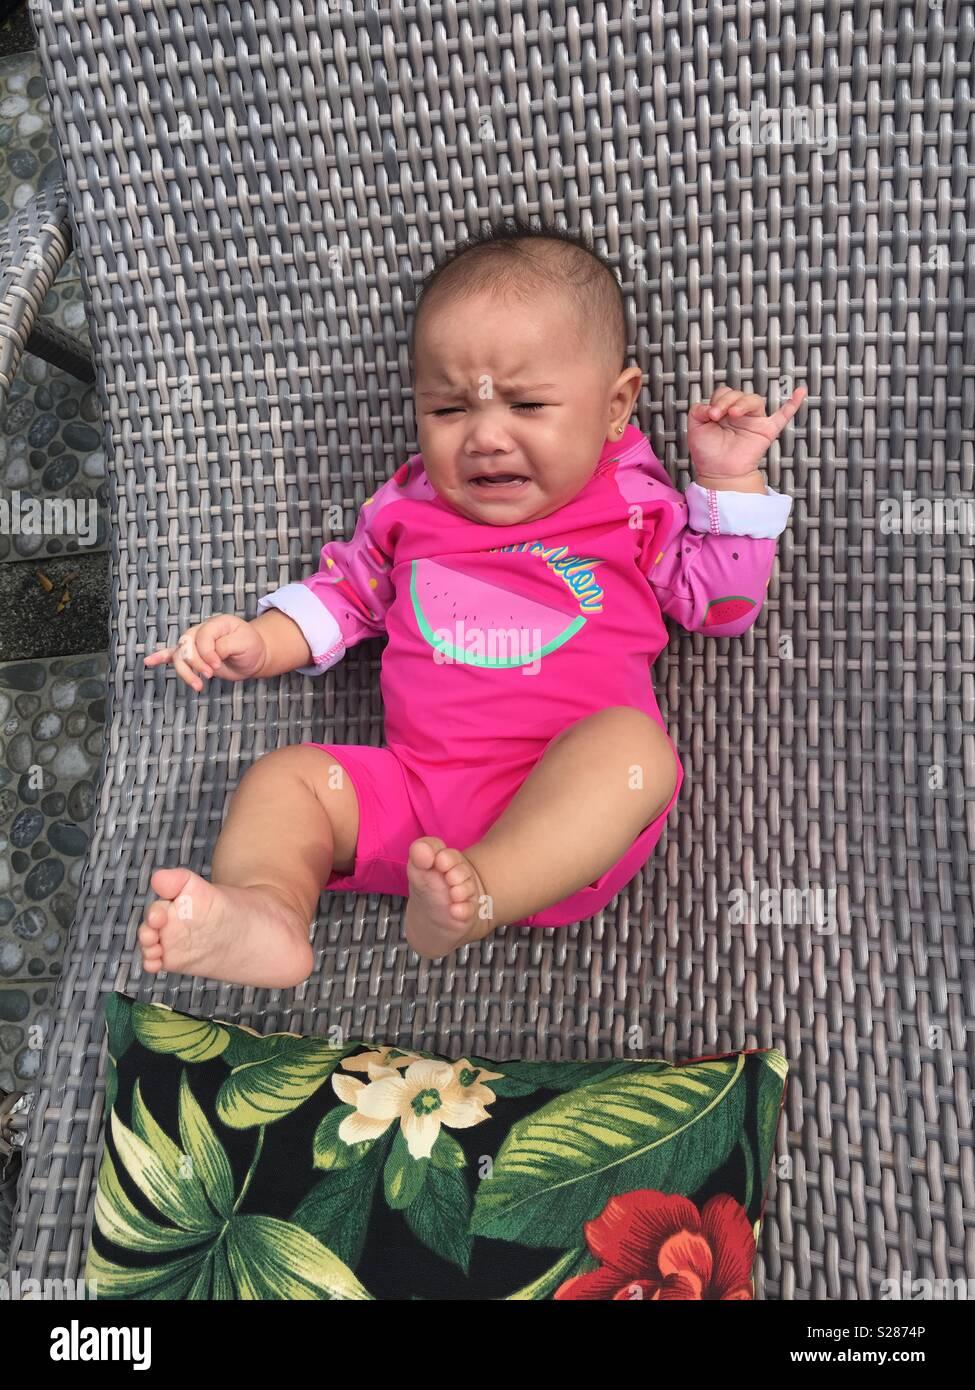 7db26fd947f7 Cute baby in her swim attire Stock Photo  311197174 - Alamy